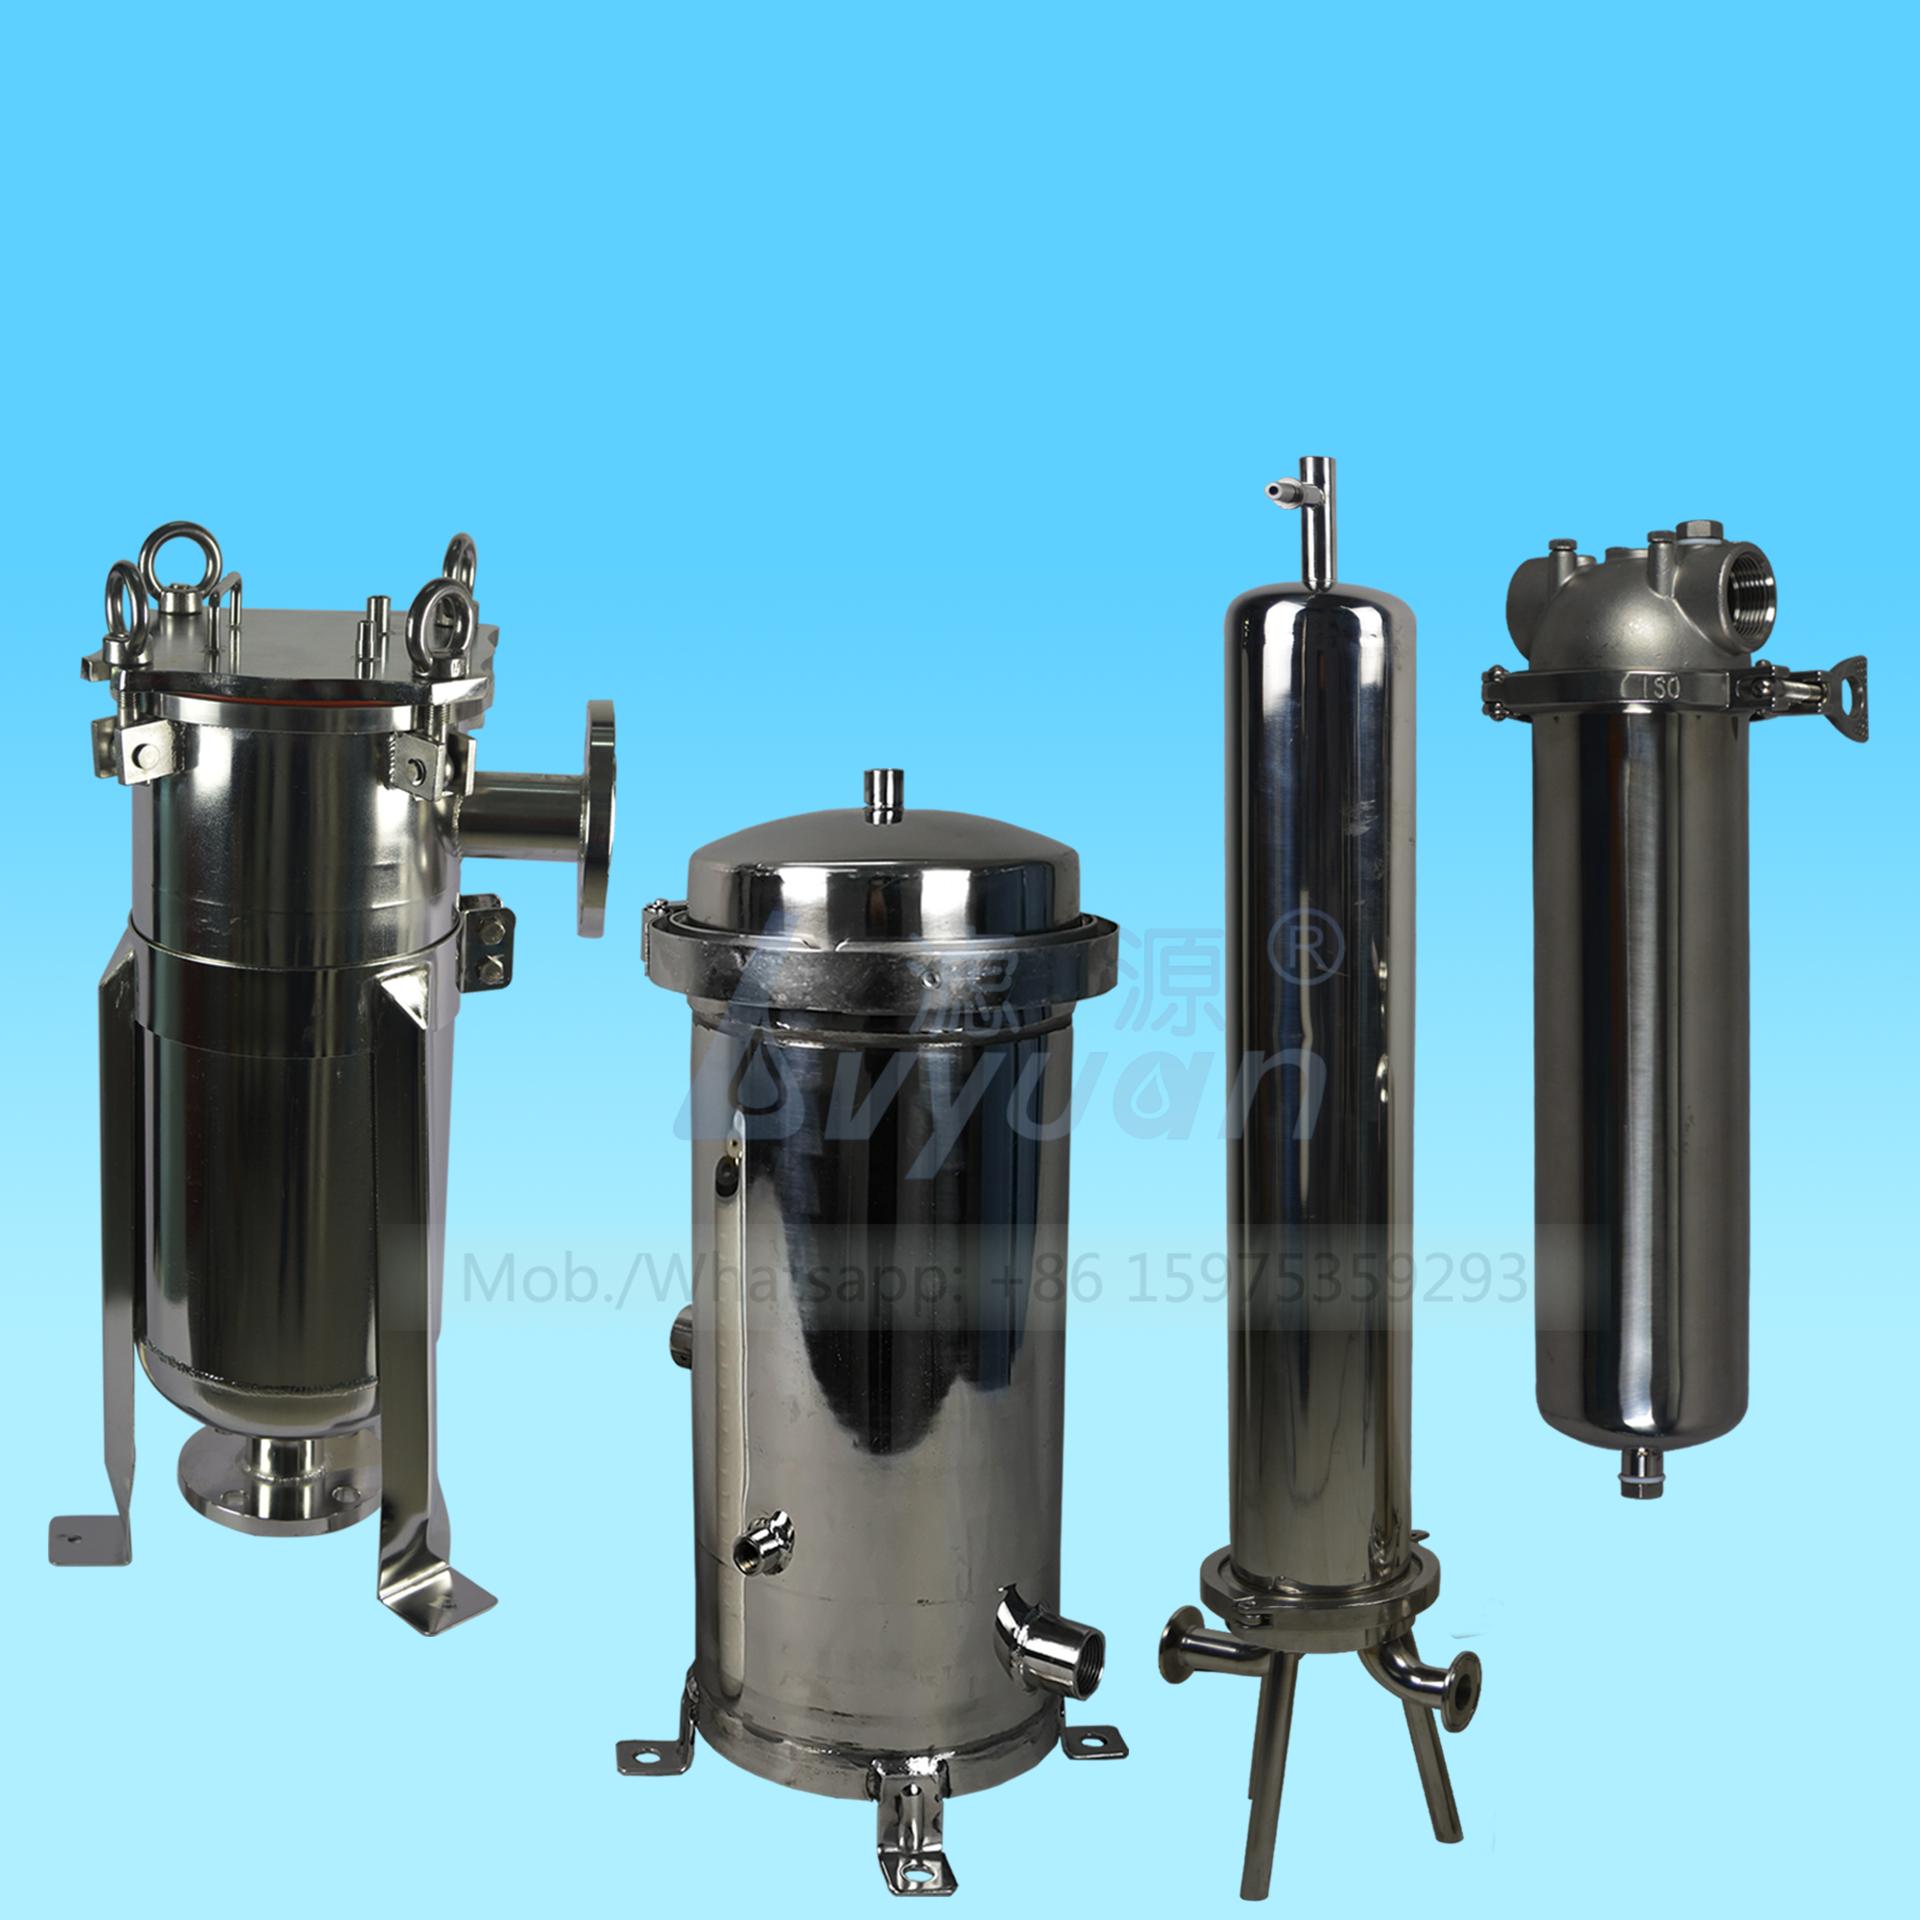 Water filter housing factory slim & jumbo cartridge bag filter type stainless steel pre filter housing supplier in China